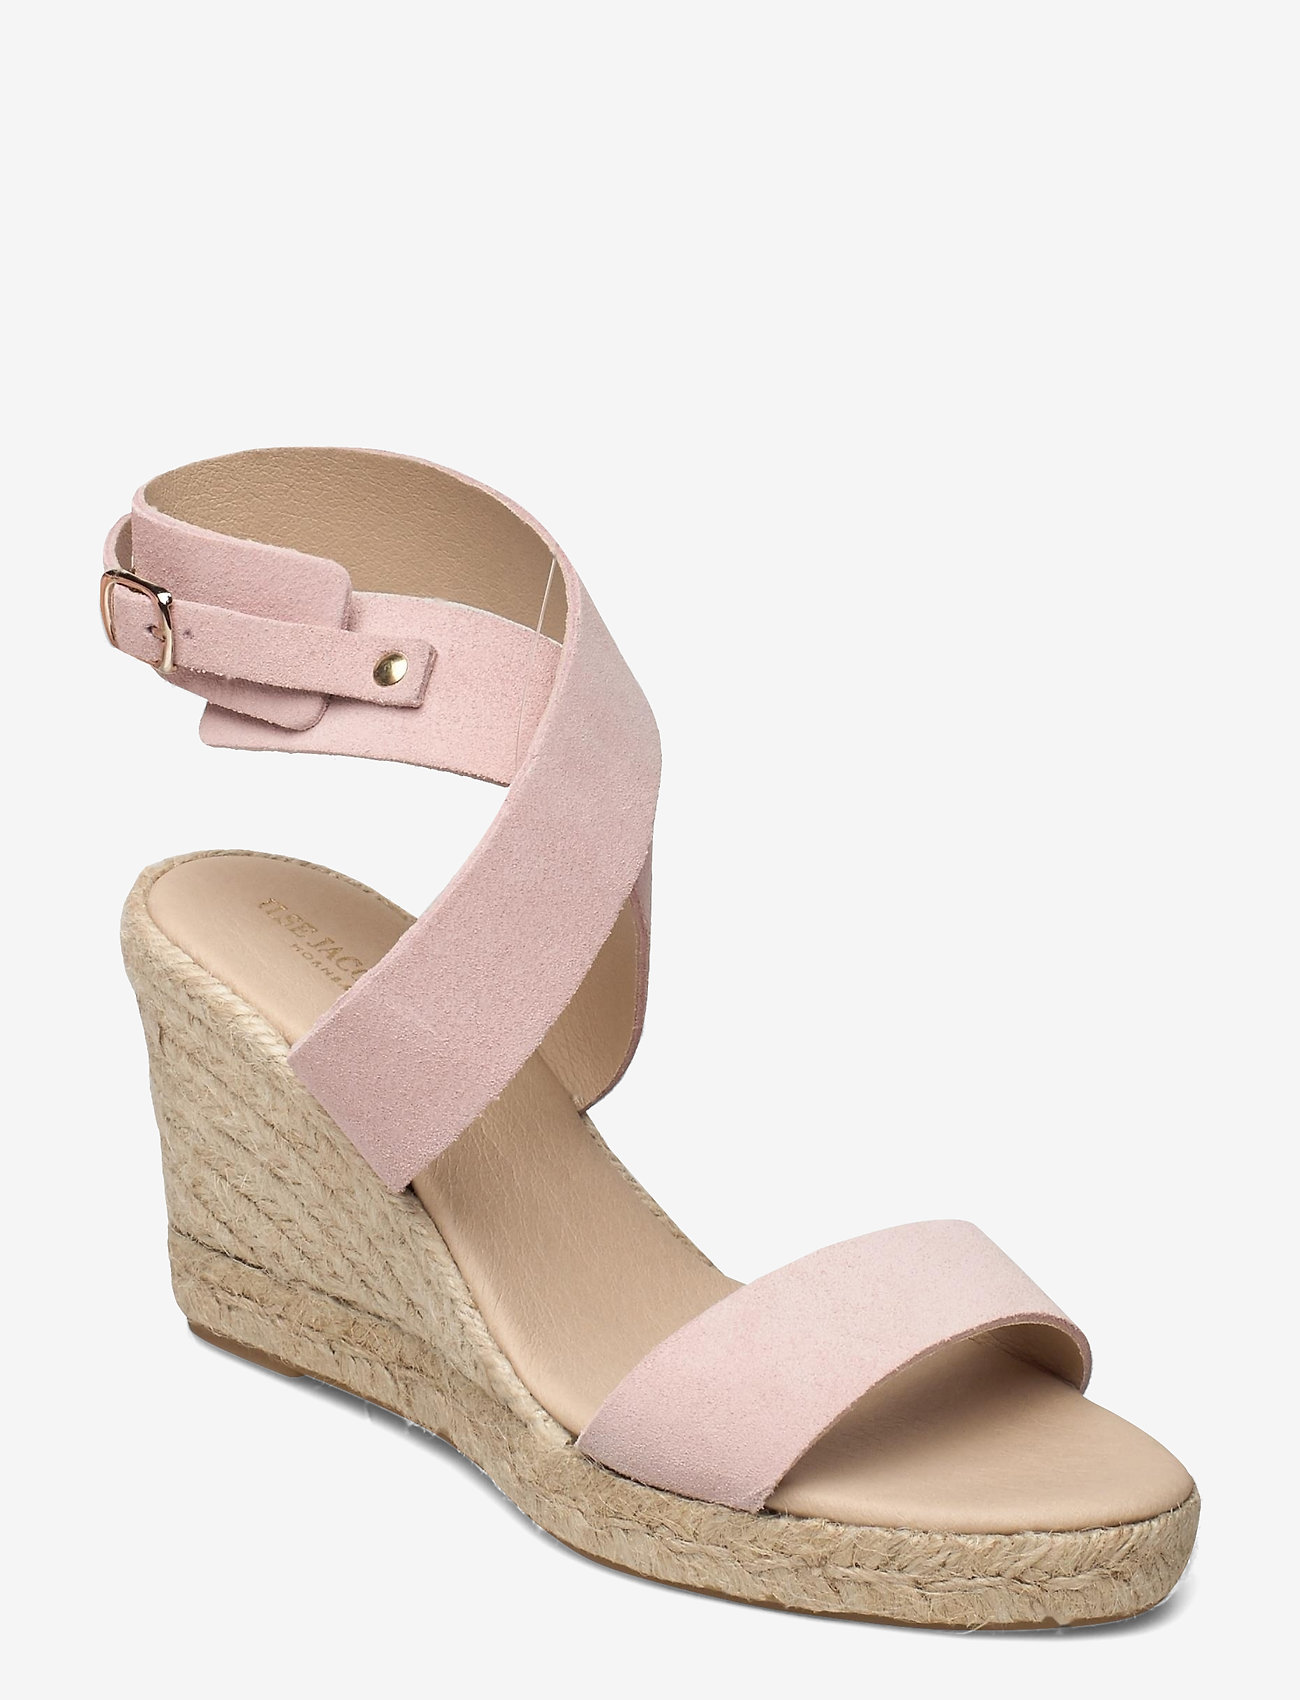 Ilse Jacobsen - High heel espadrilles - espadrilles mit absatz - pale blush - 0